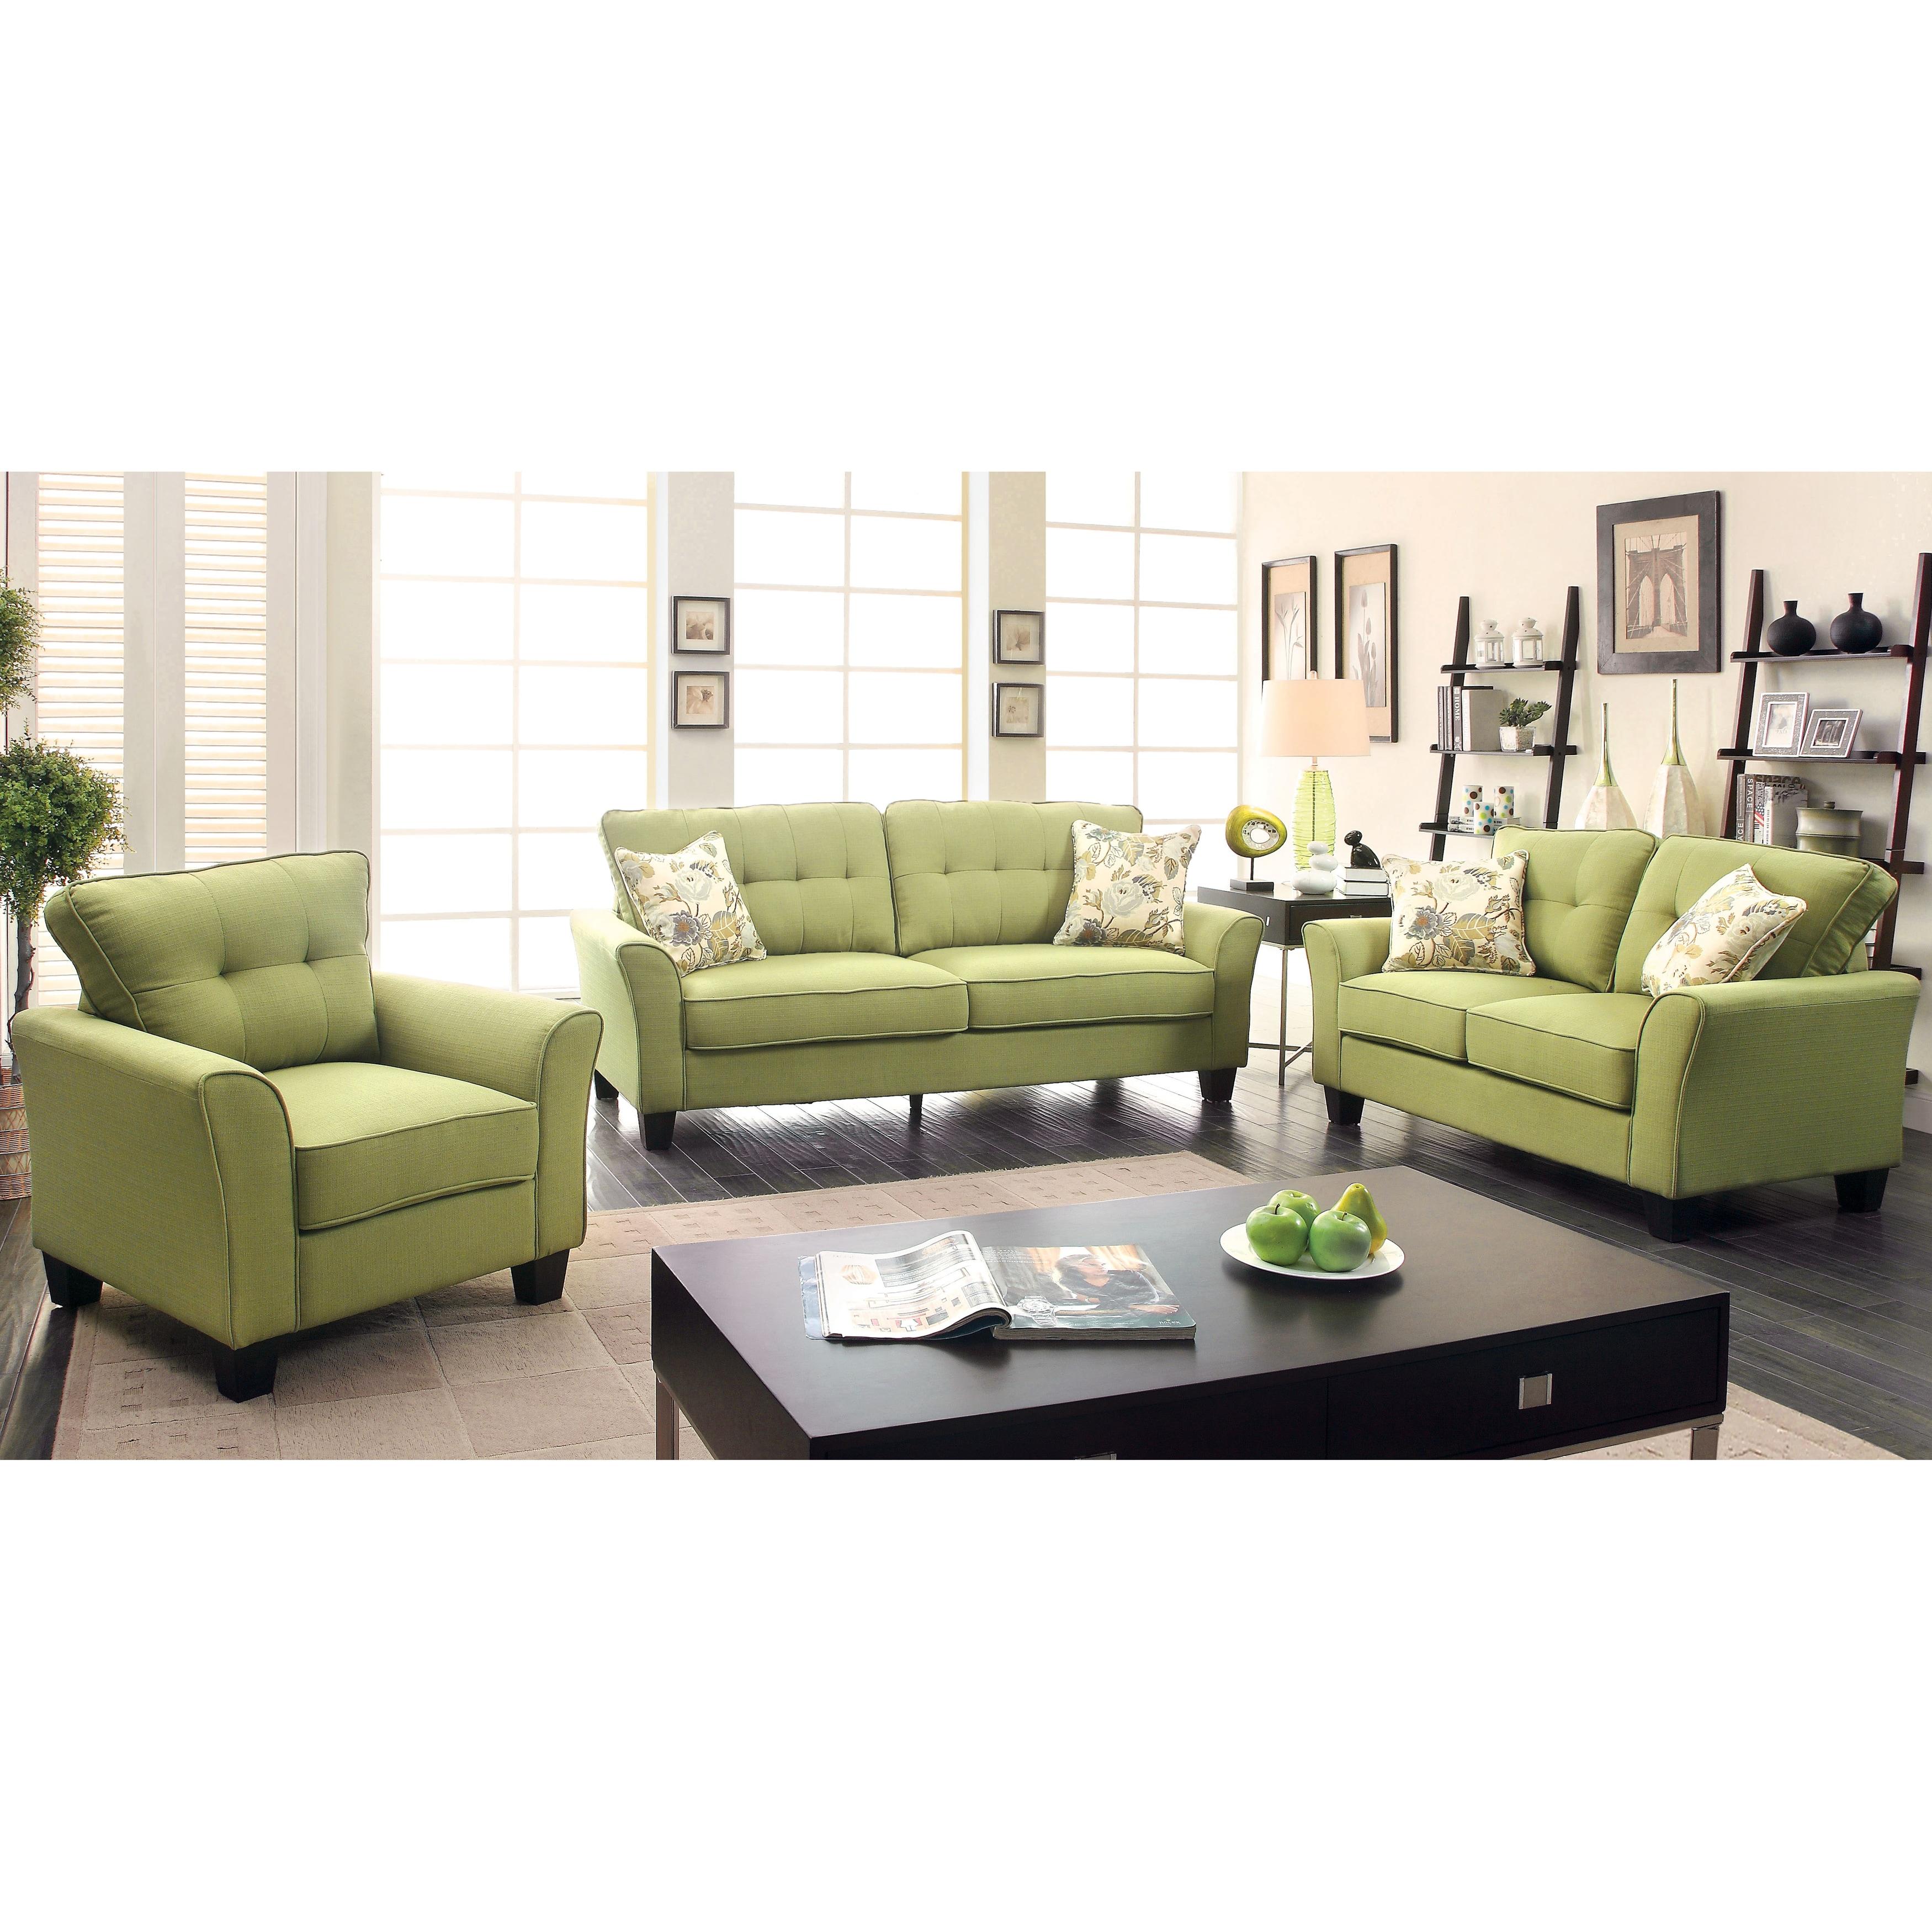 Furniture of America Primavera Modern 3-Piece Linen Living Room Set ...